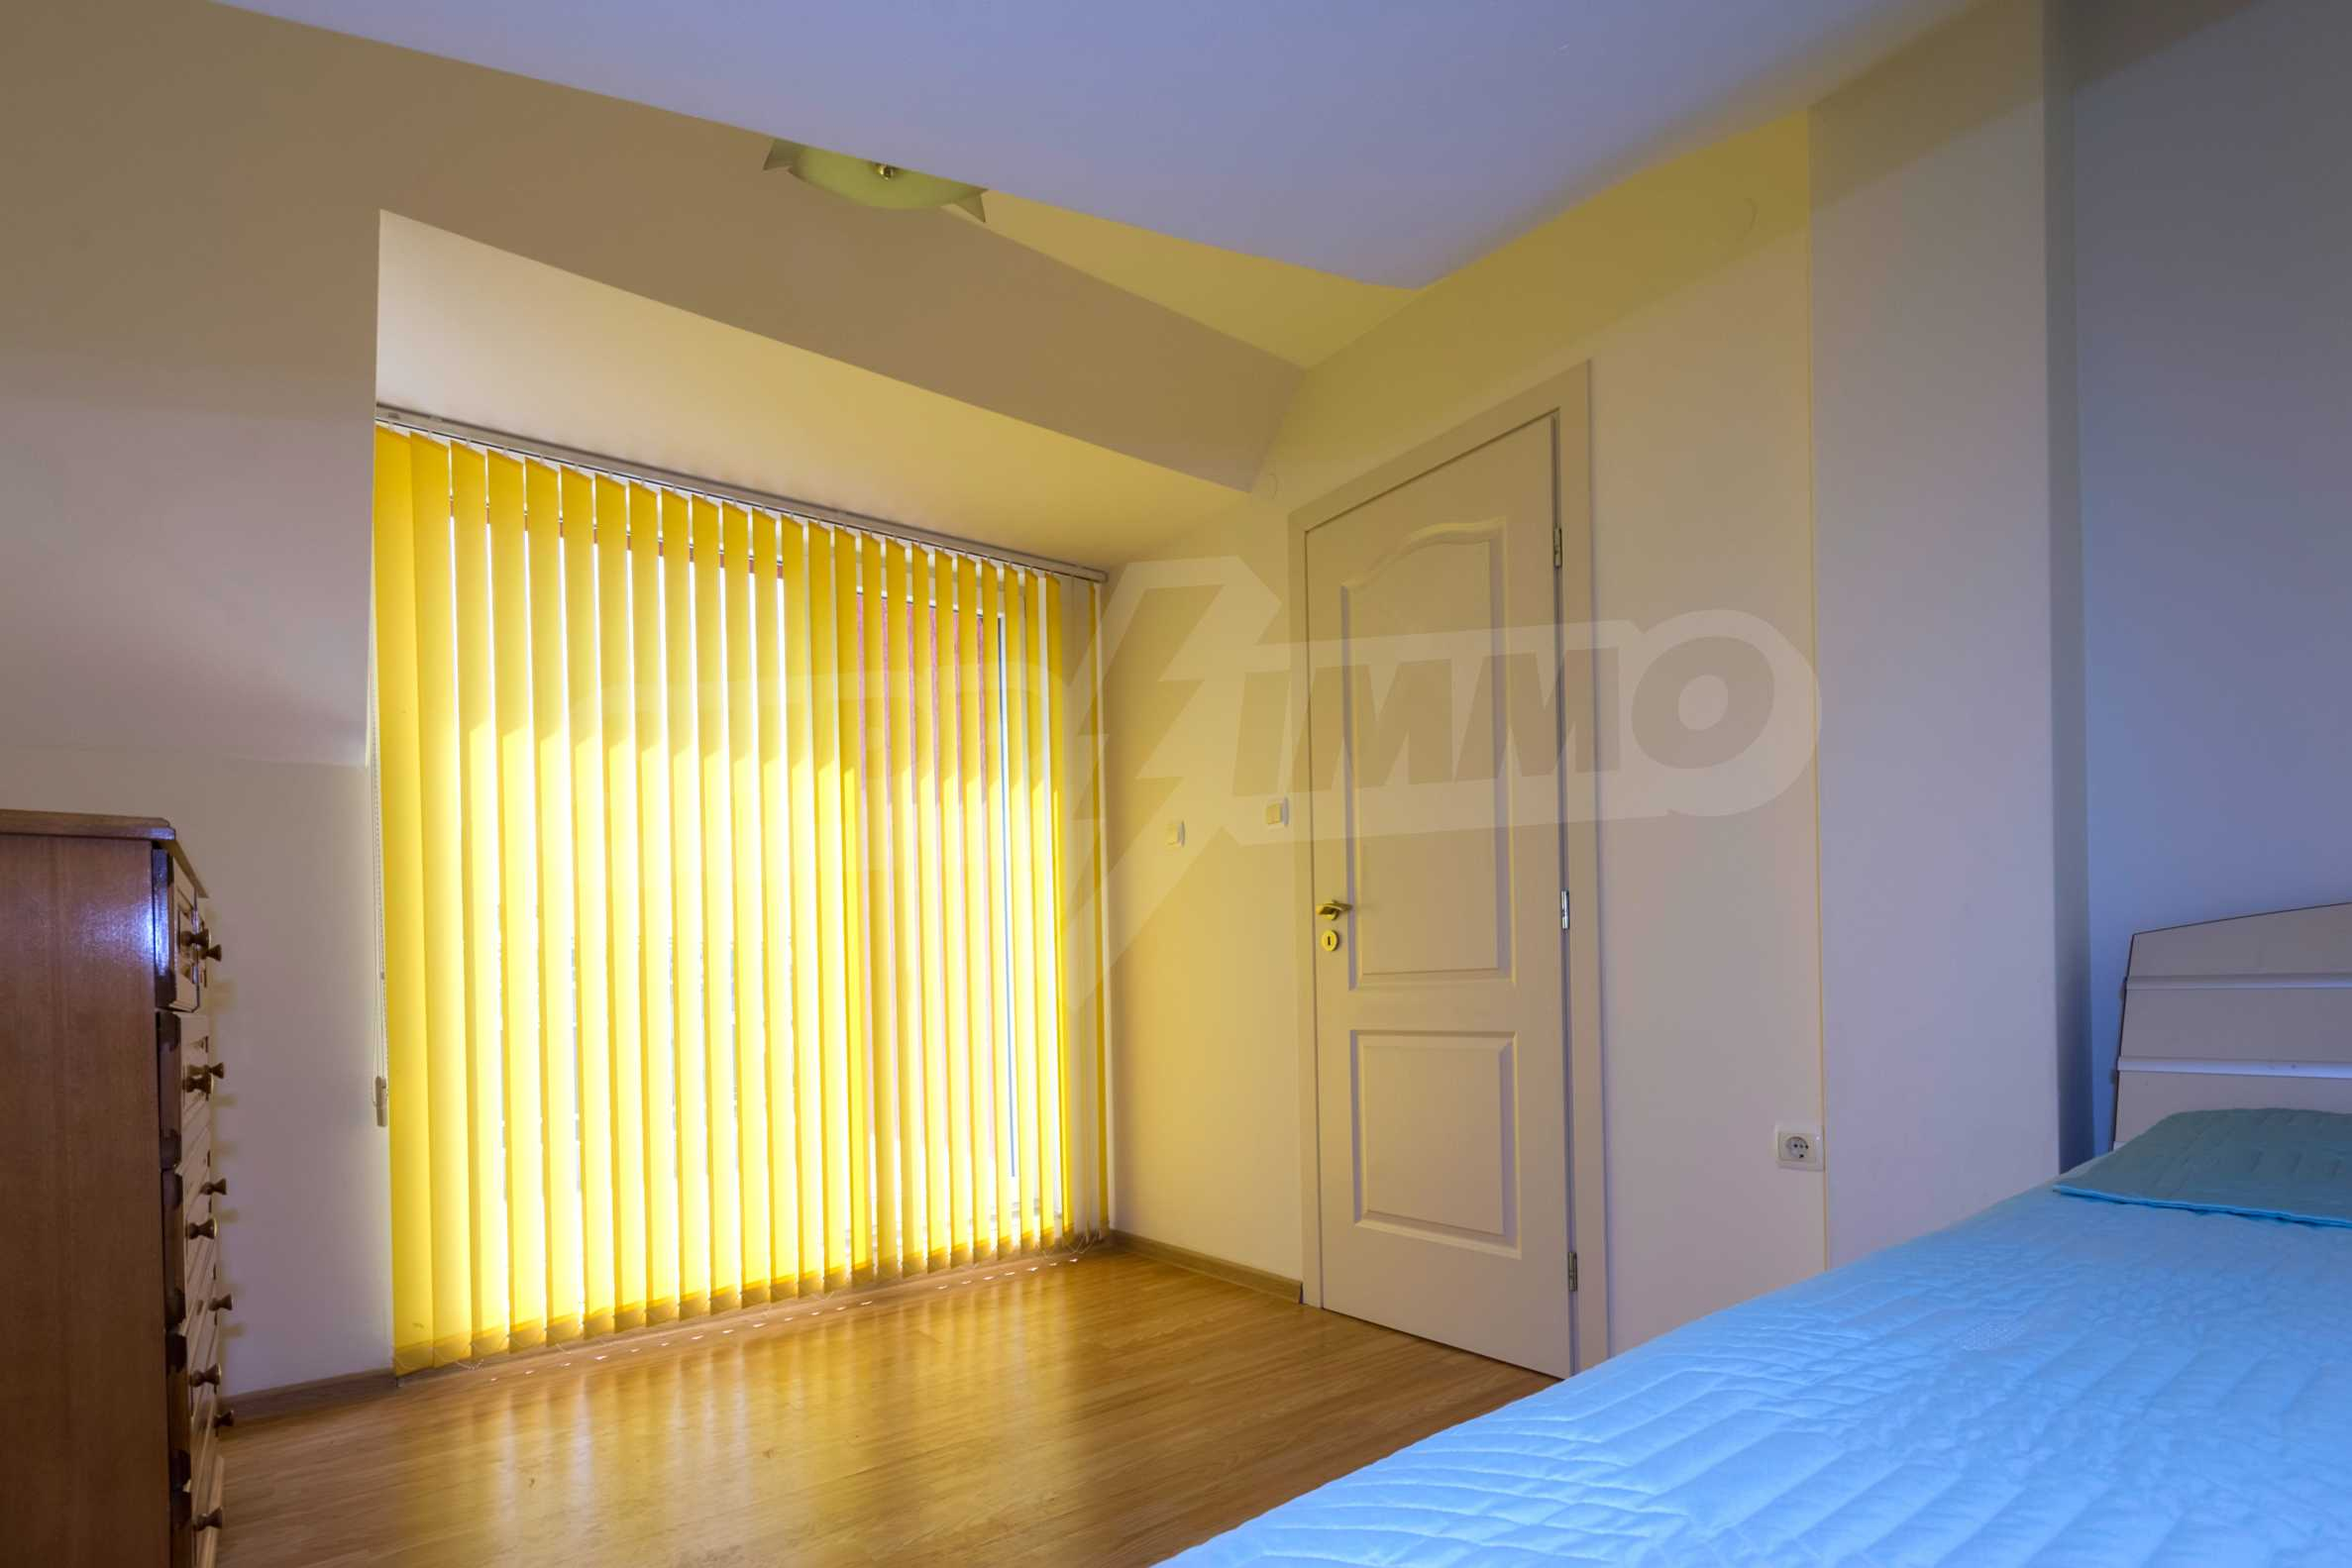 Многостаен апартамент до Гранд Хотел Пловдив 3